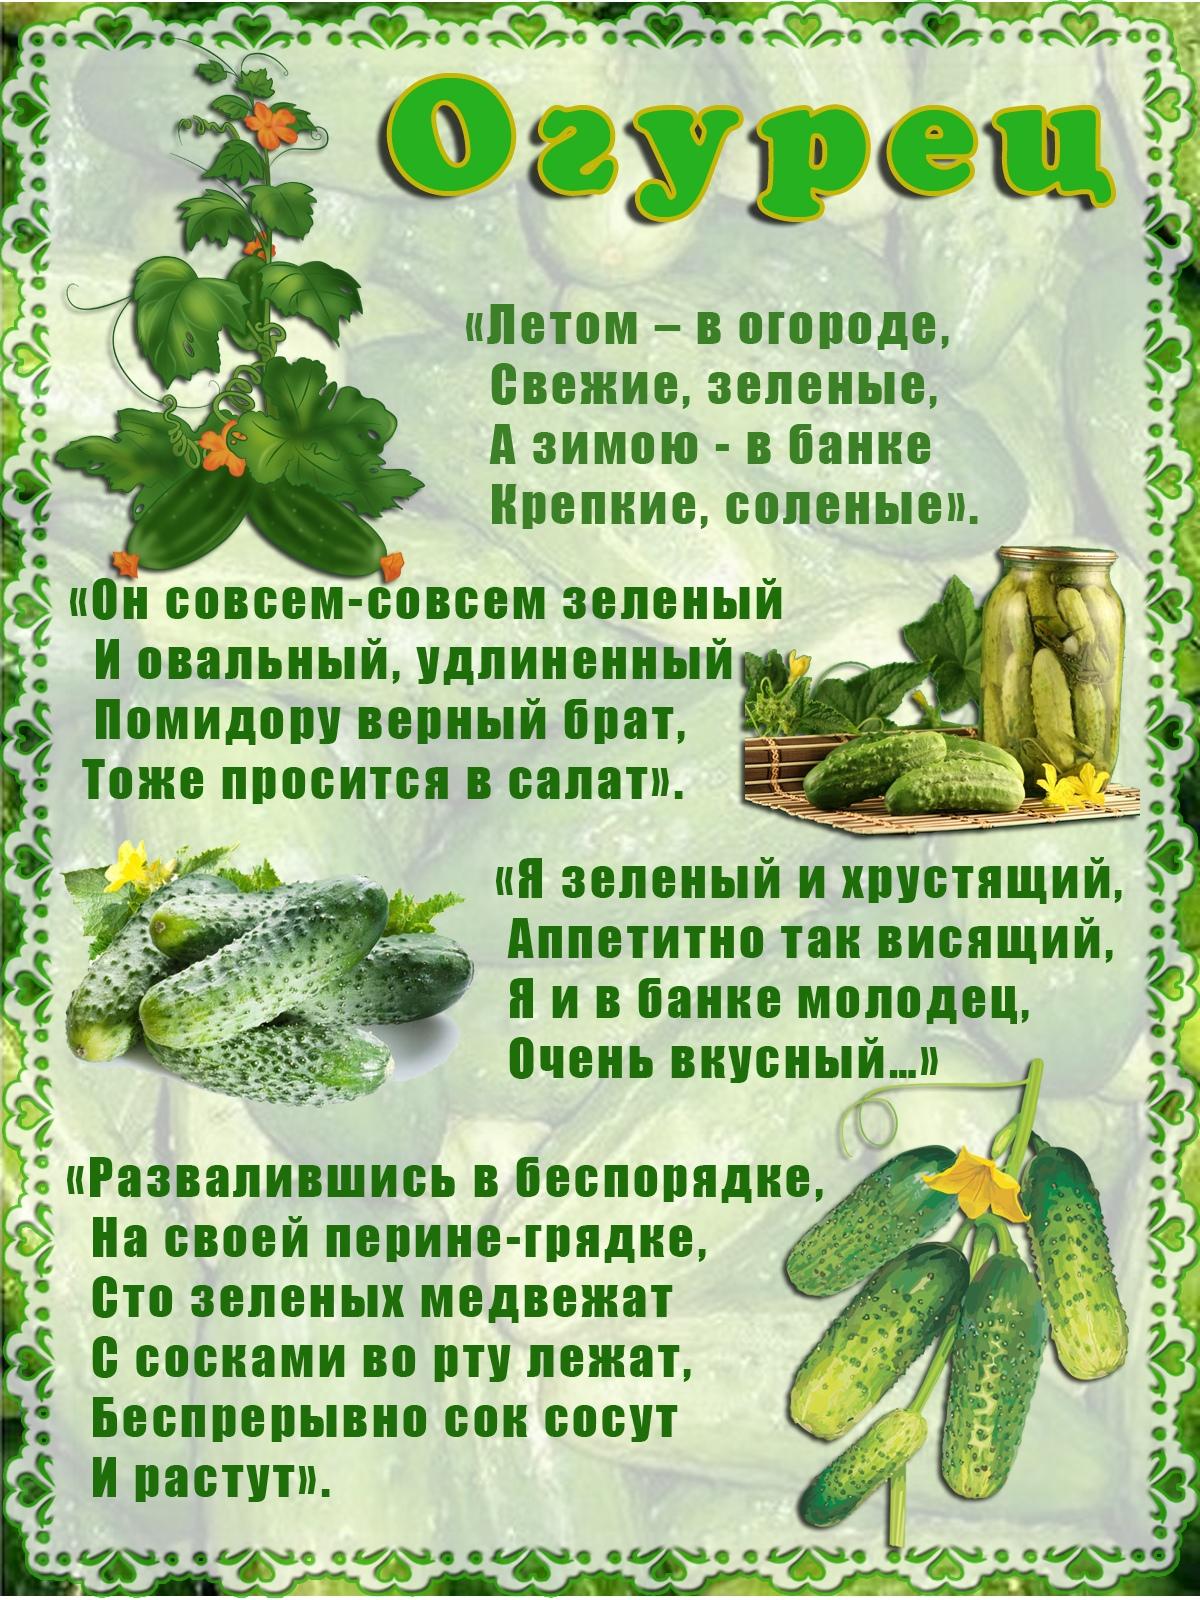 пословицы про овощи с картинками лечебном корпусе